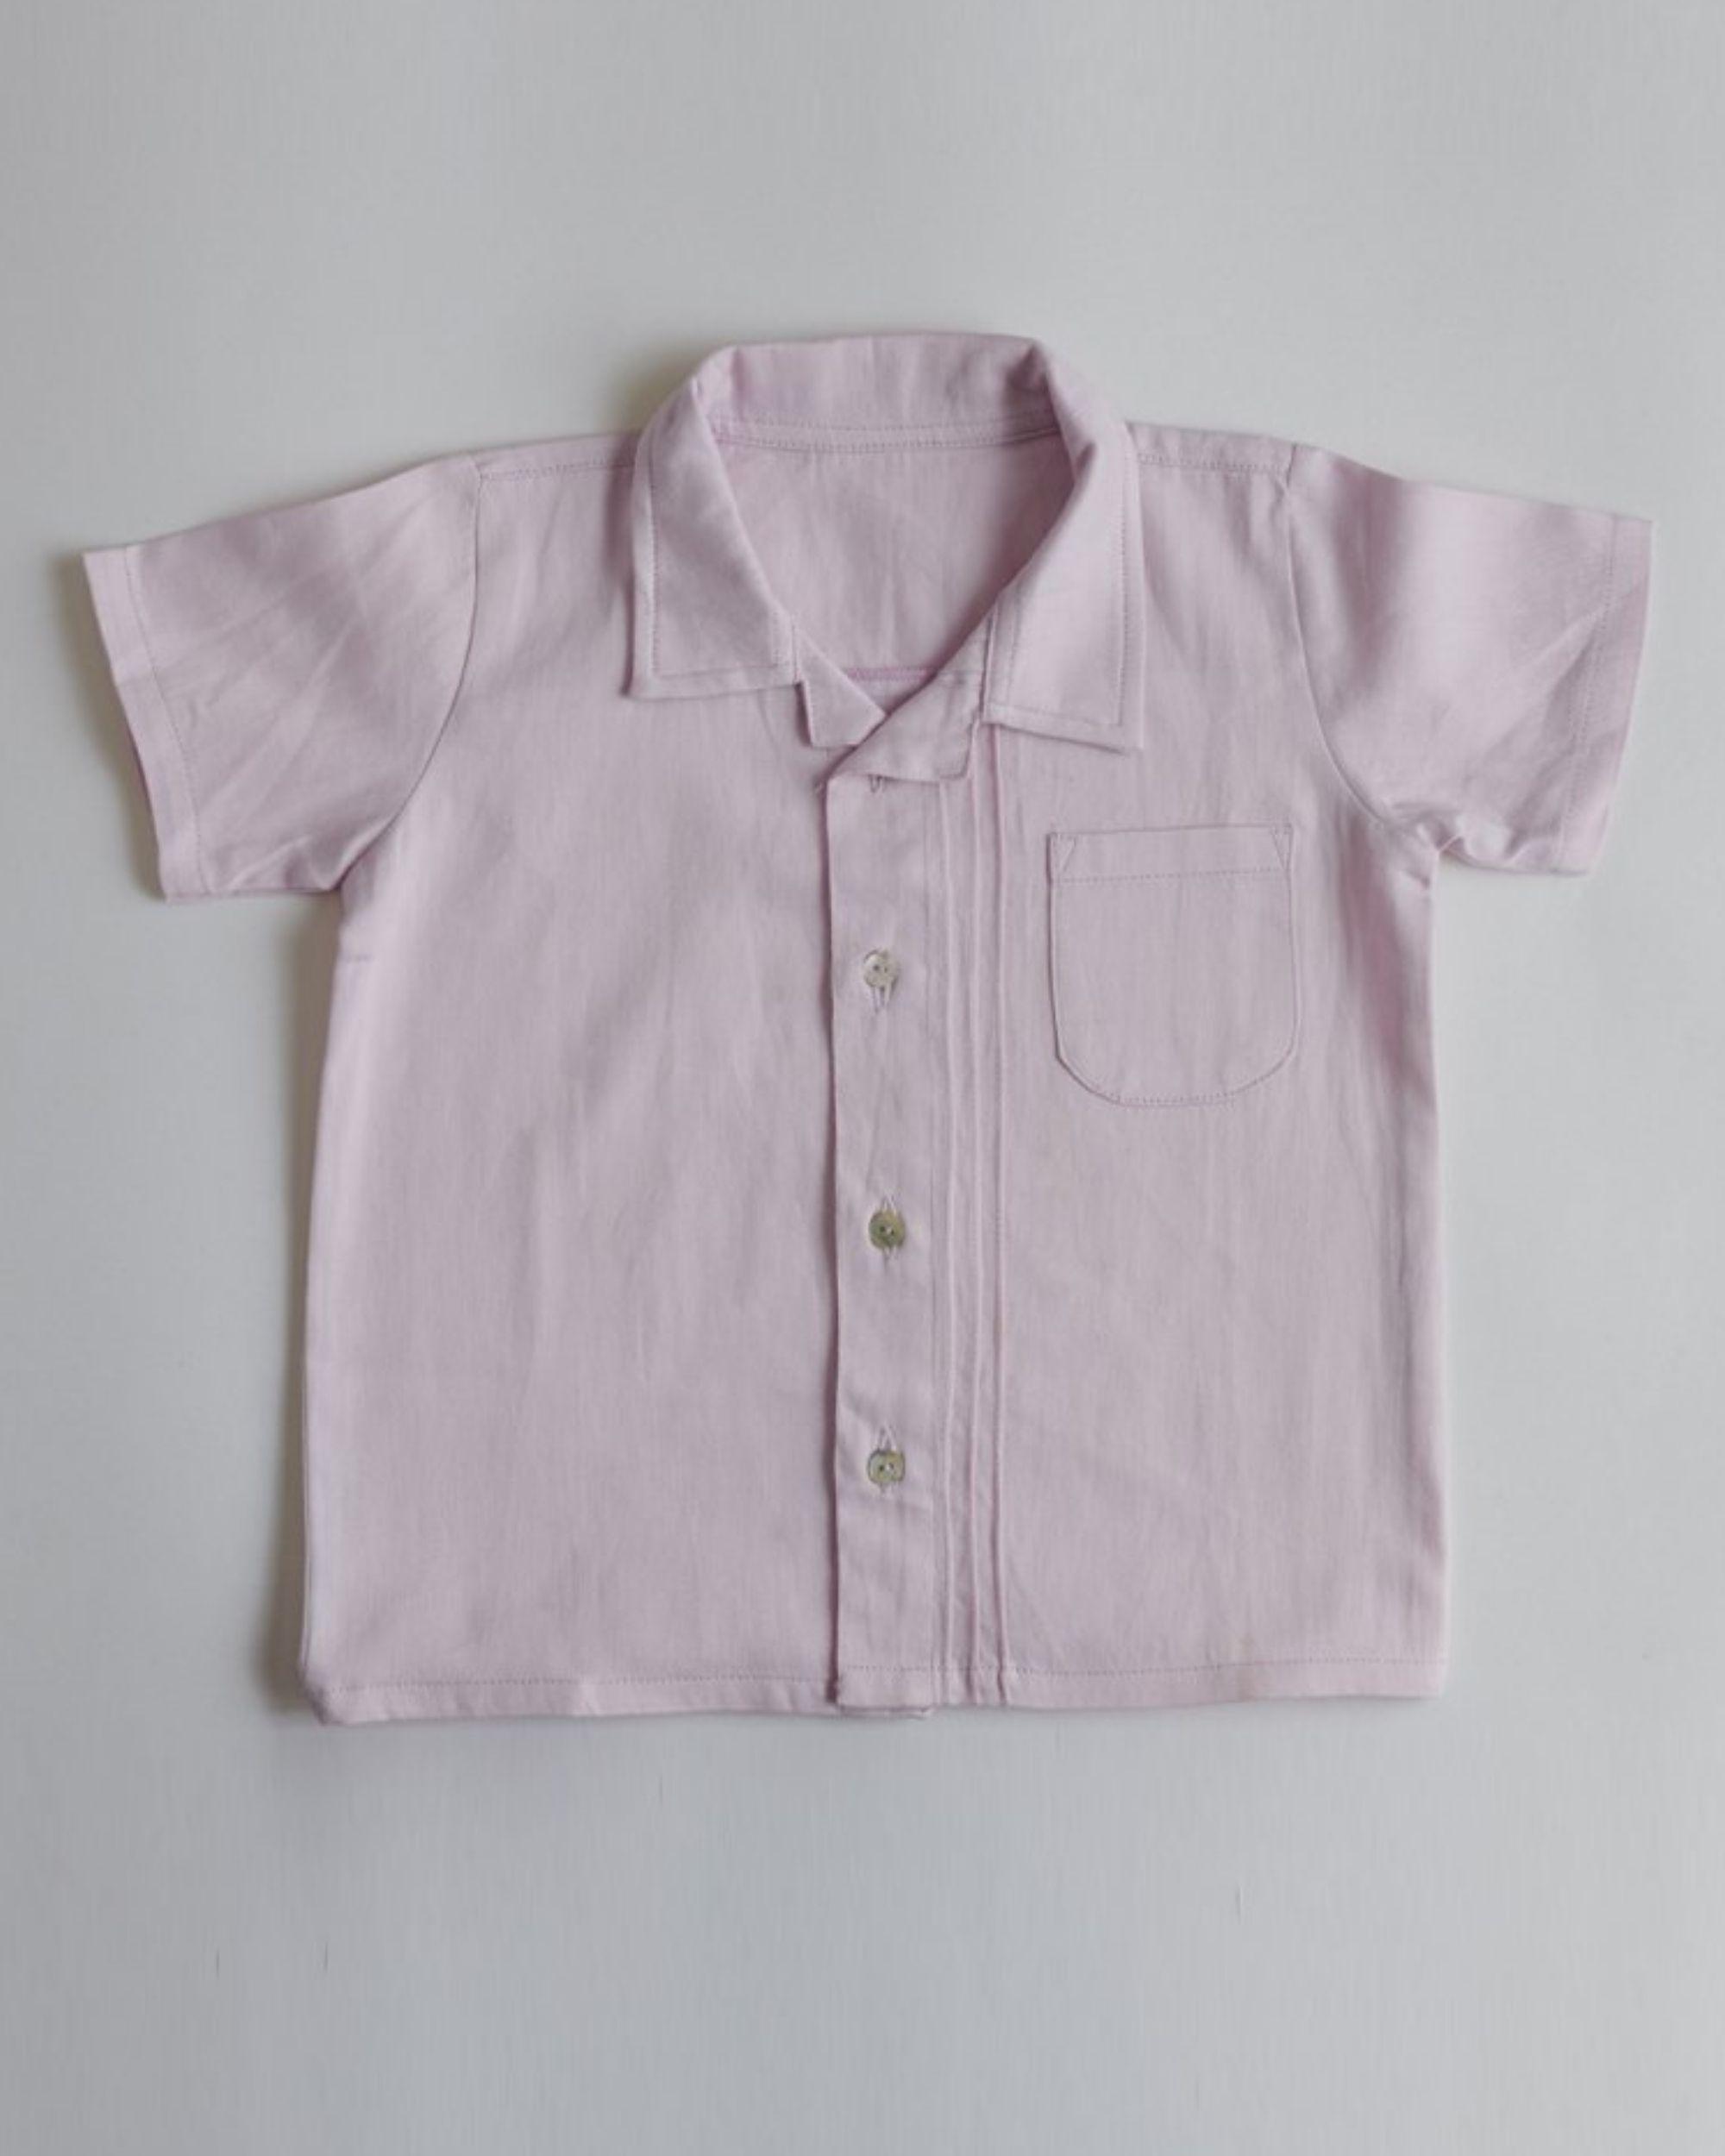 Lavender organic cotton shirt